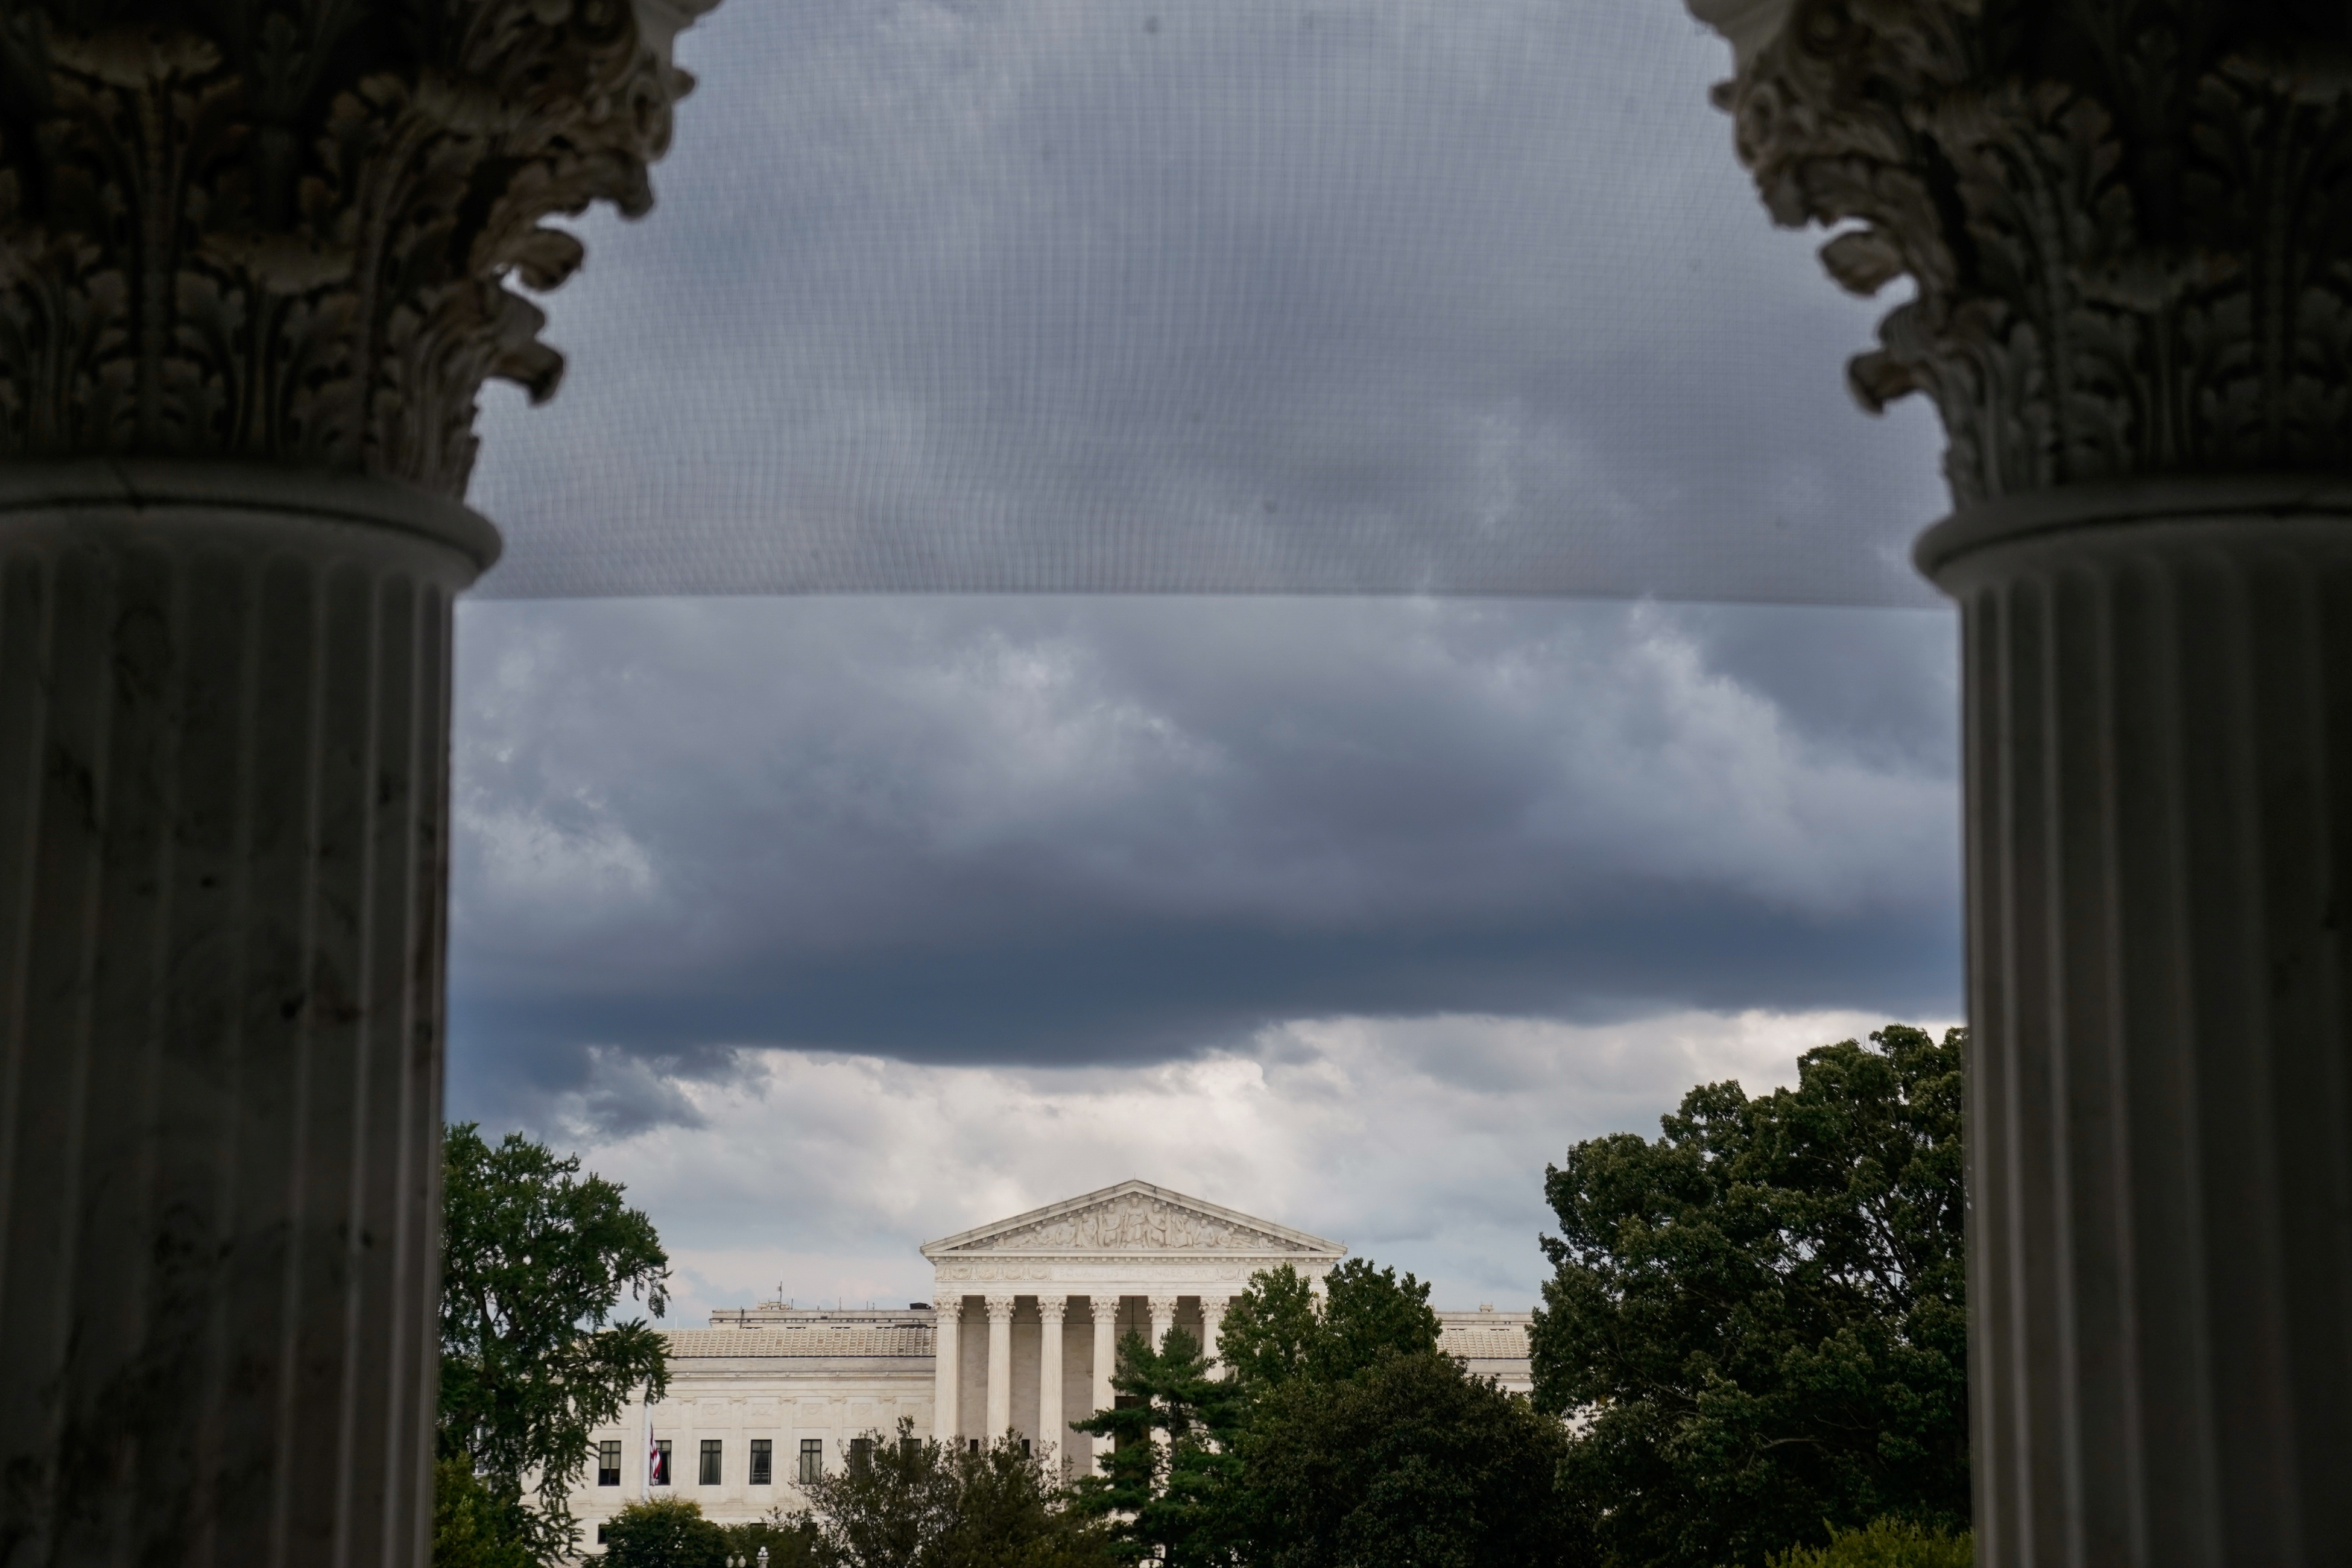 The U.S. Supreme Court is seen through the U.S. Capitol columns in Washington, U.S. September 29, 2020. REUTERS/Erin Scott - RC2M8J9LQRI7